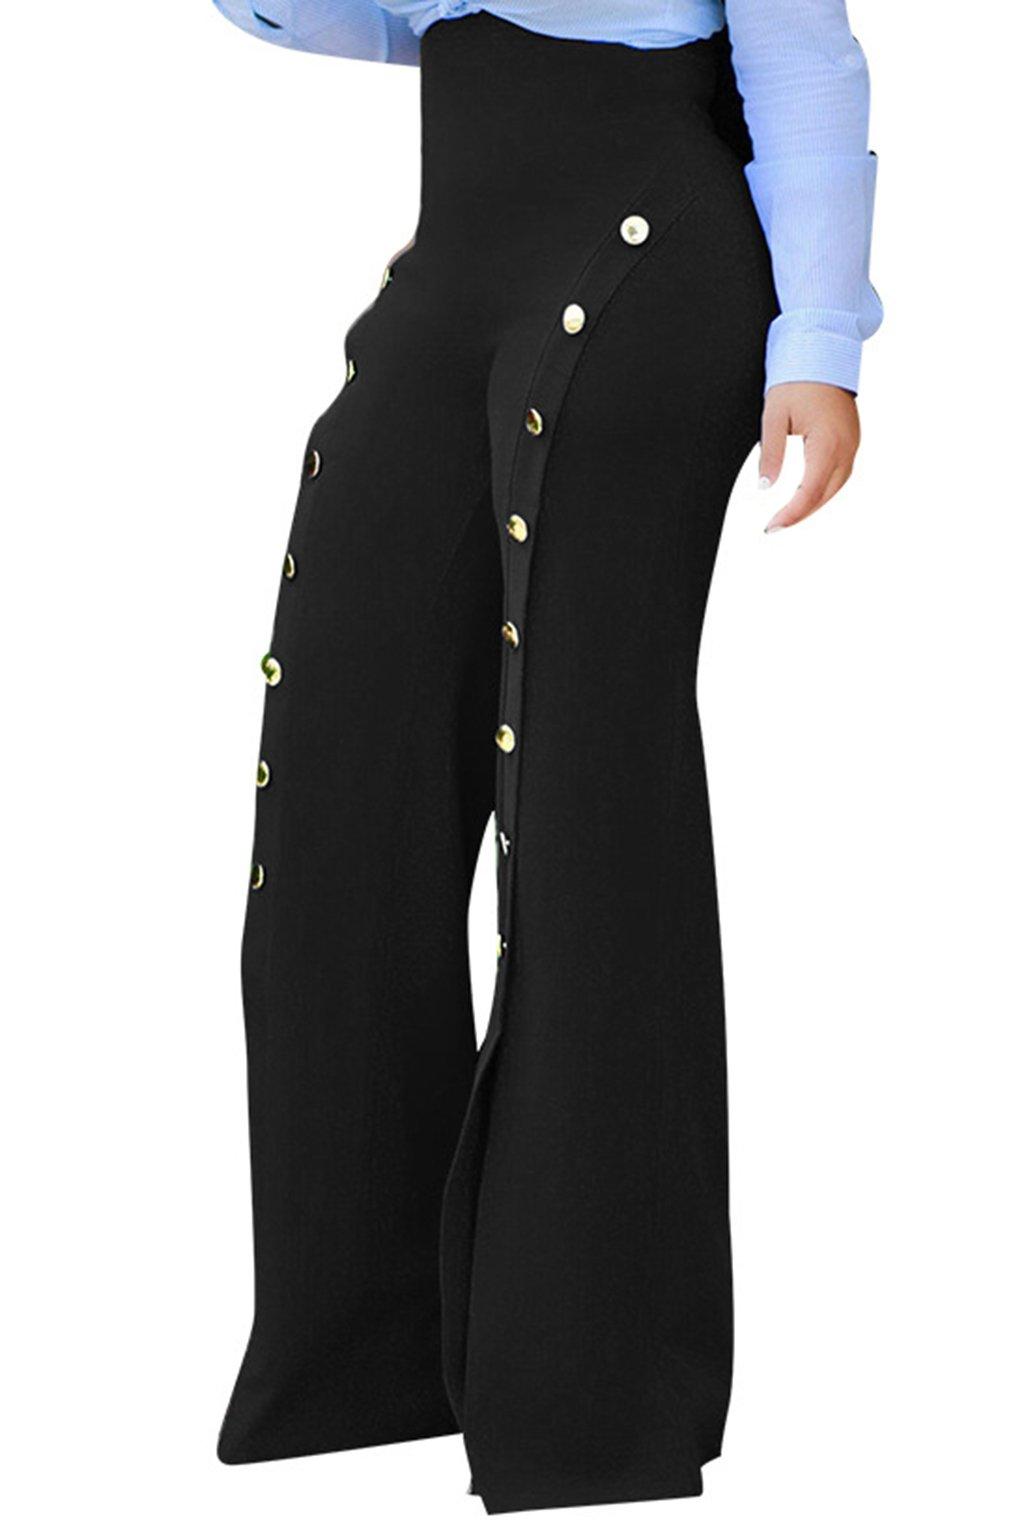 GUOLEZEEV Junior High Waist Flare Wide Leg Long Vintage Pants Palazzo Trousers Black XXL